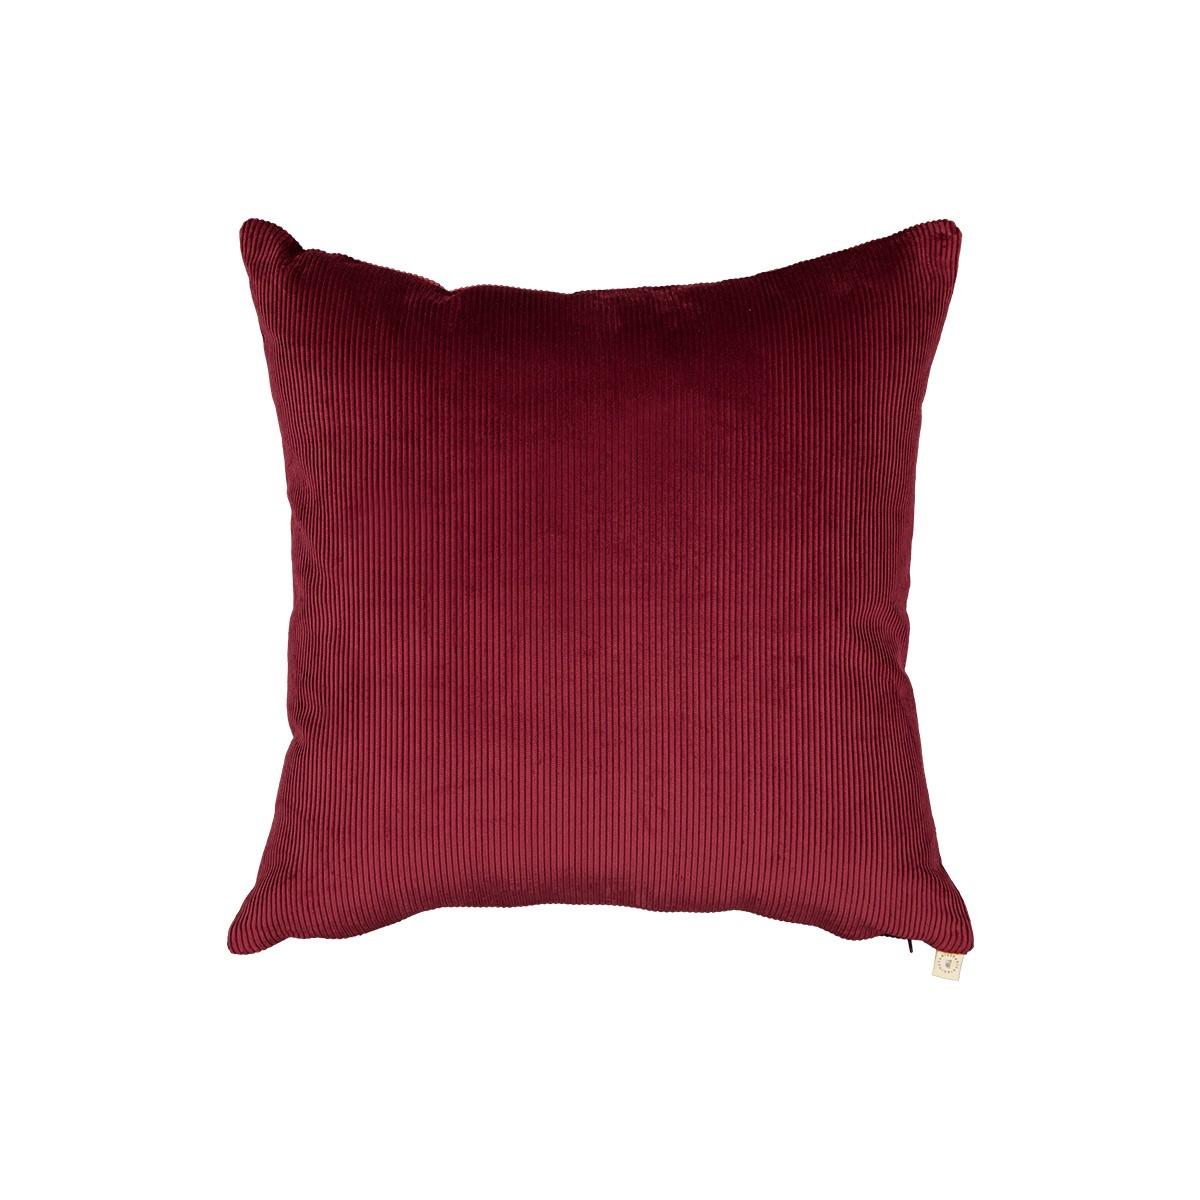 Carino plum corduroy cushion